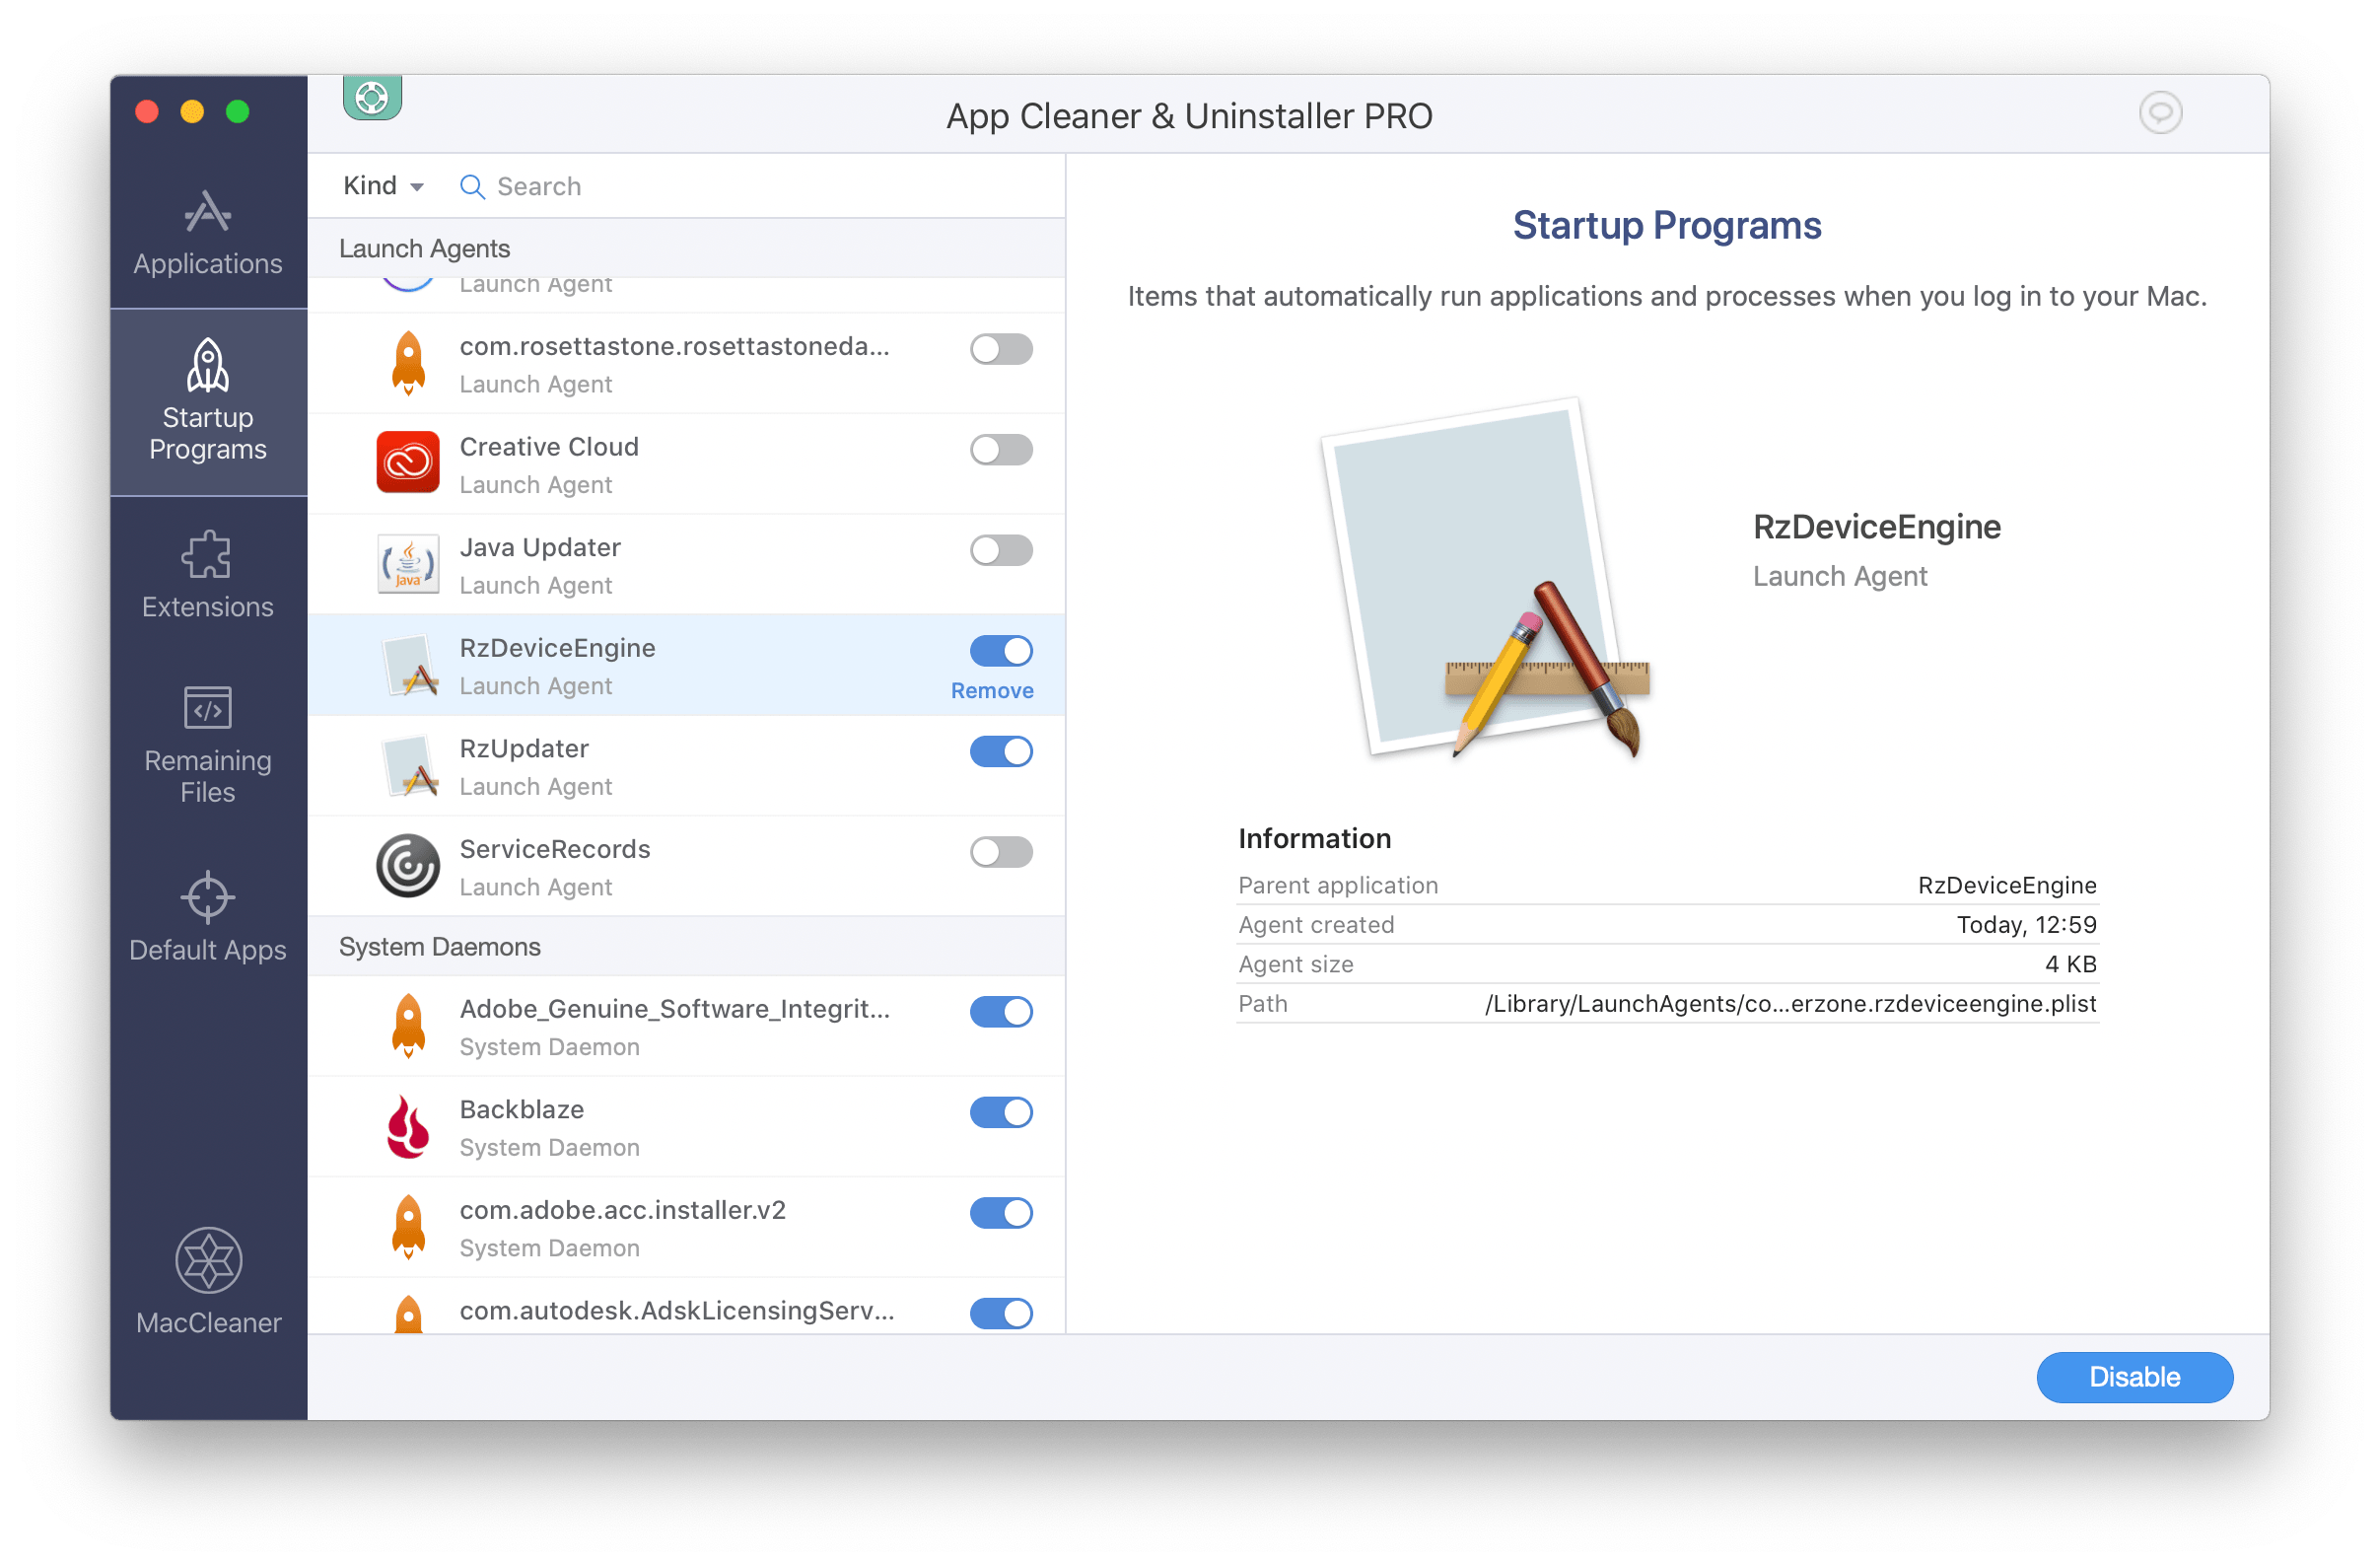 App Cleaner & Uninstaller window showing Startup Programs tab